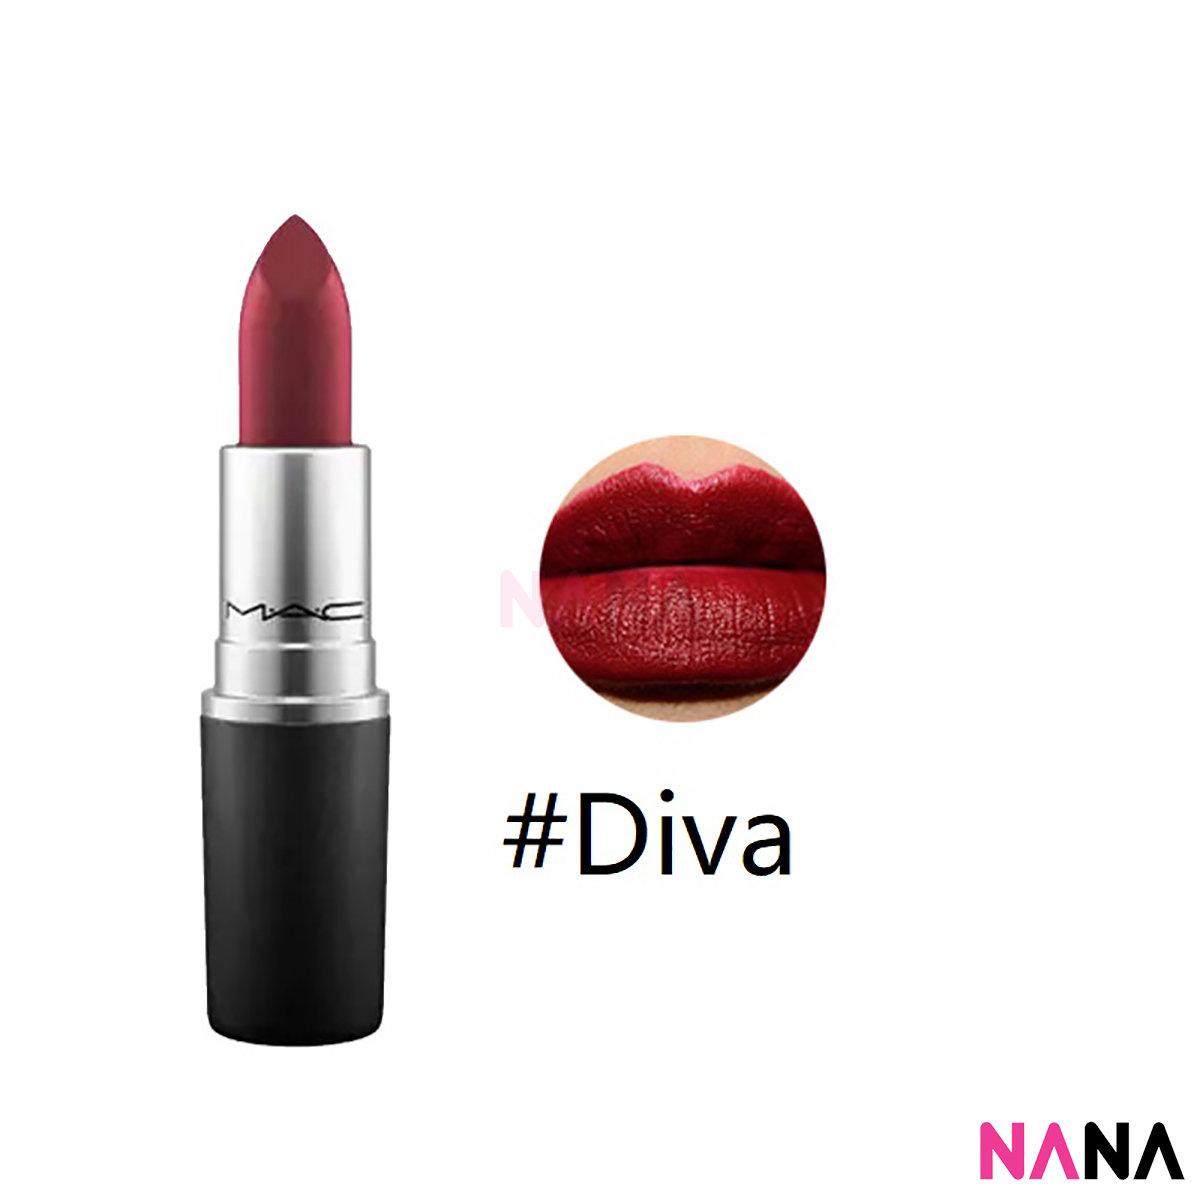 Matte Lipstick - Diva #603 3g